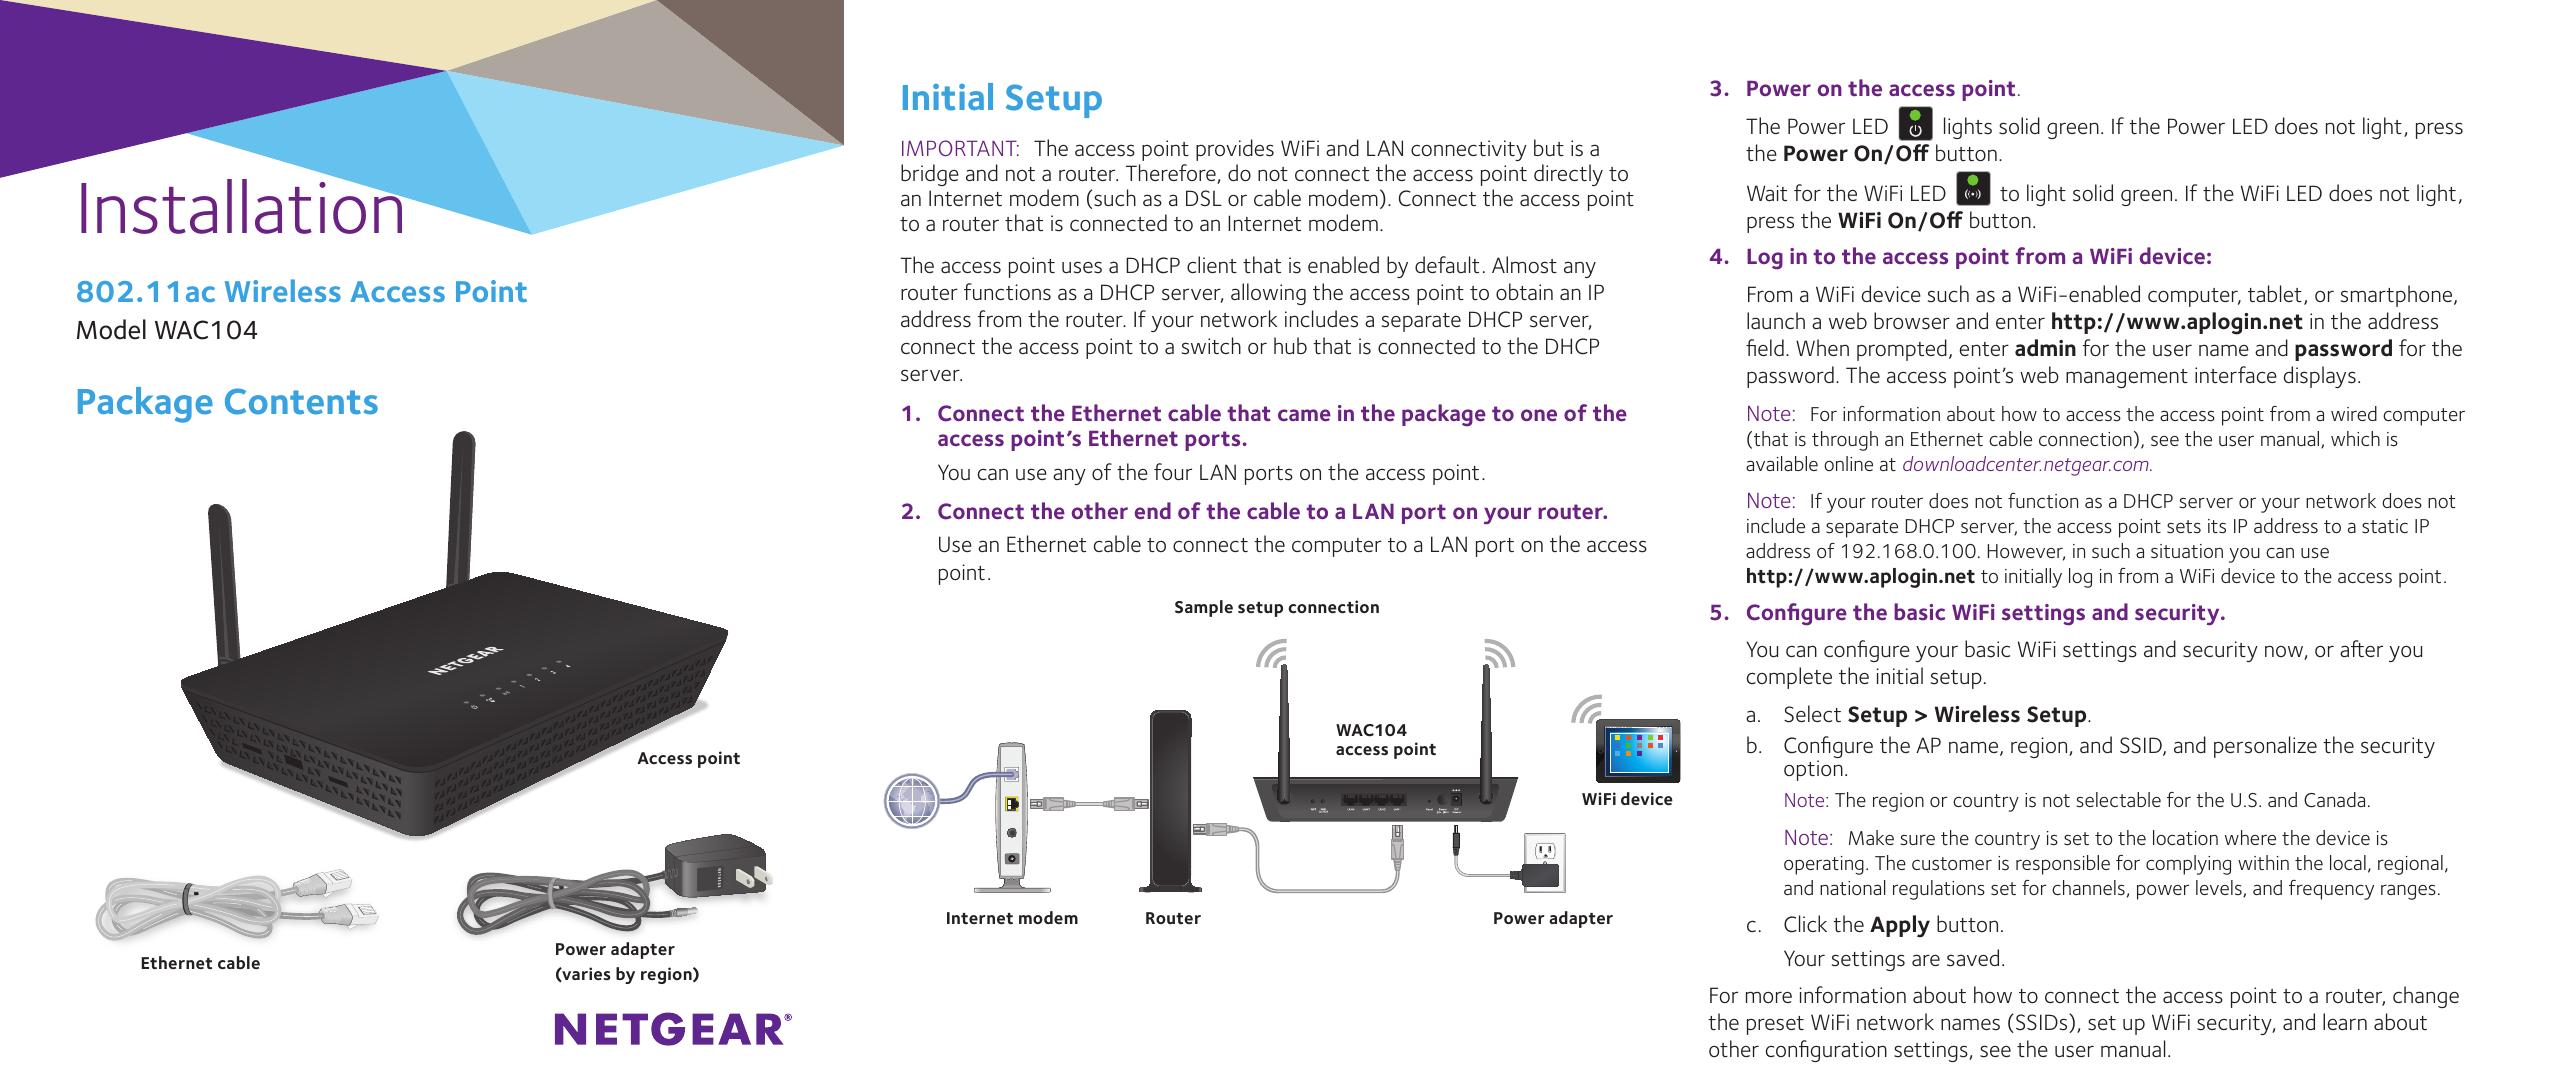 NETGEAR 802 11ac Wireless Access Point Model WAC104